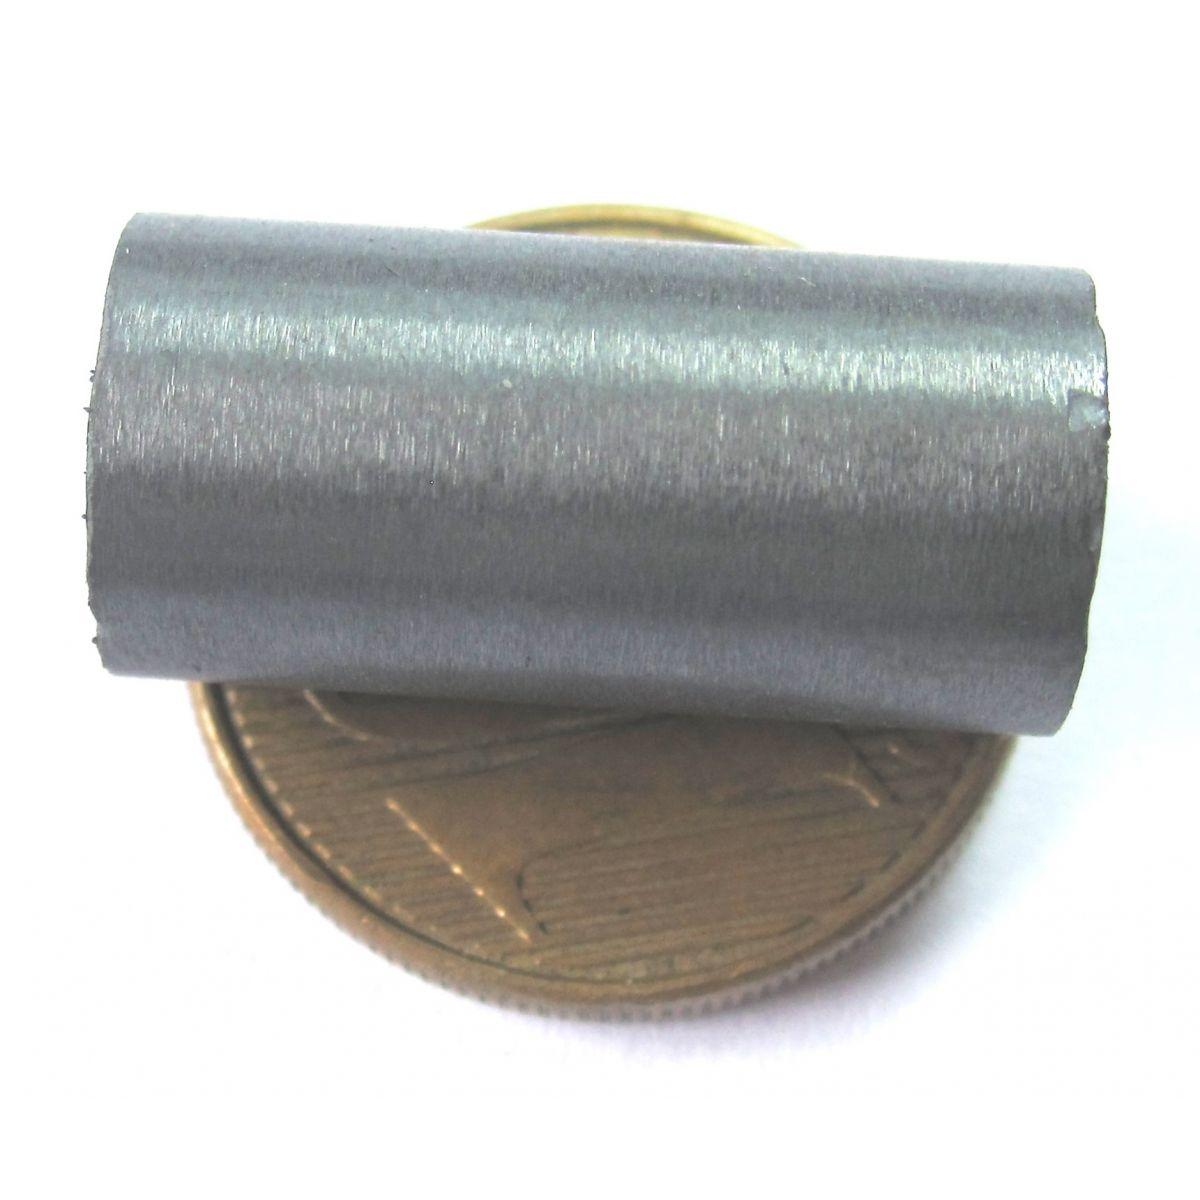 Imã de Ferrite Cilindro (cerâmica) Y30 10x20 mm